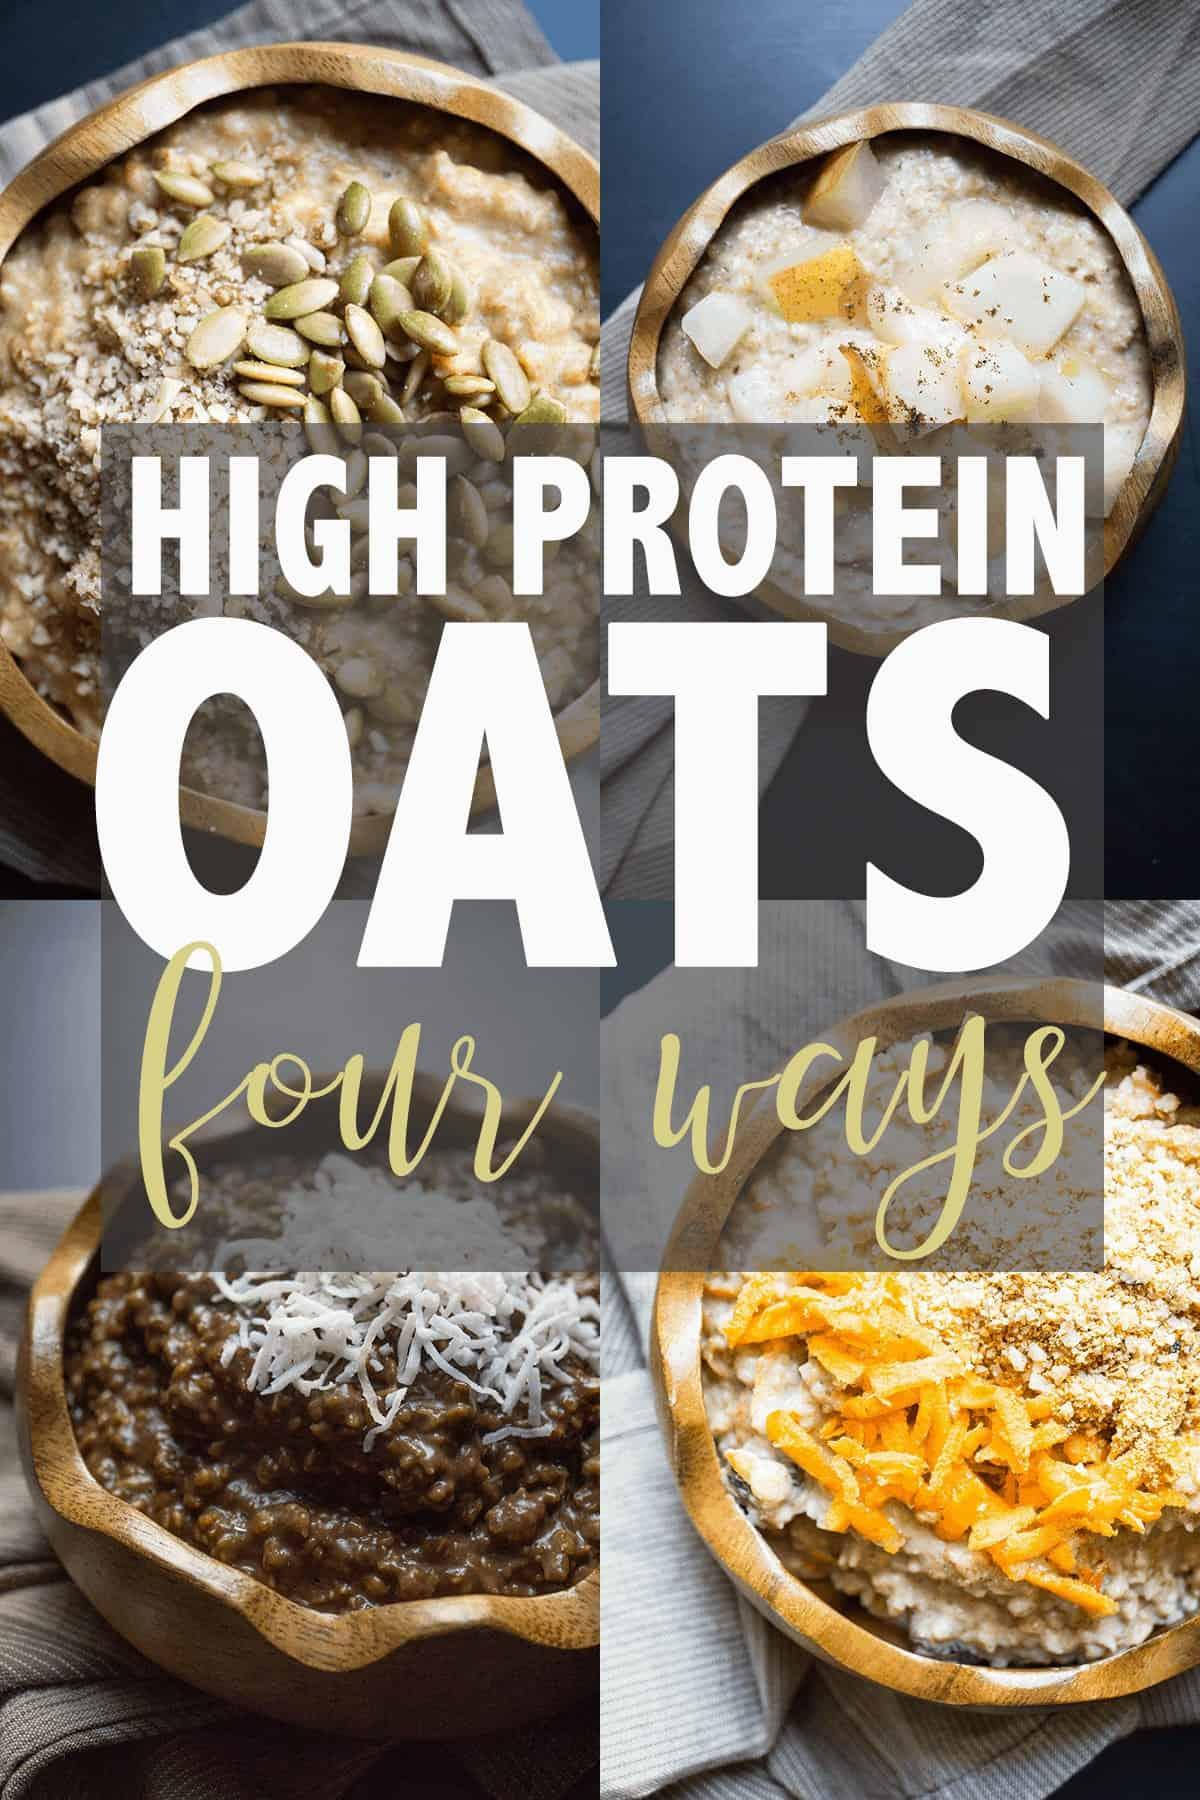 High Protein Oatmeal #highproteinbreakfast #highprotein #oatmeal #glutenfree #glutenfreebreakfast #healthybreakfast